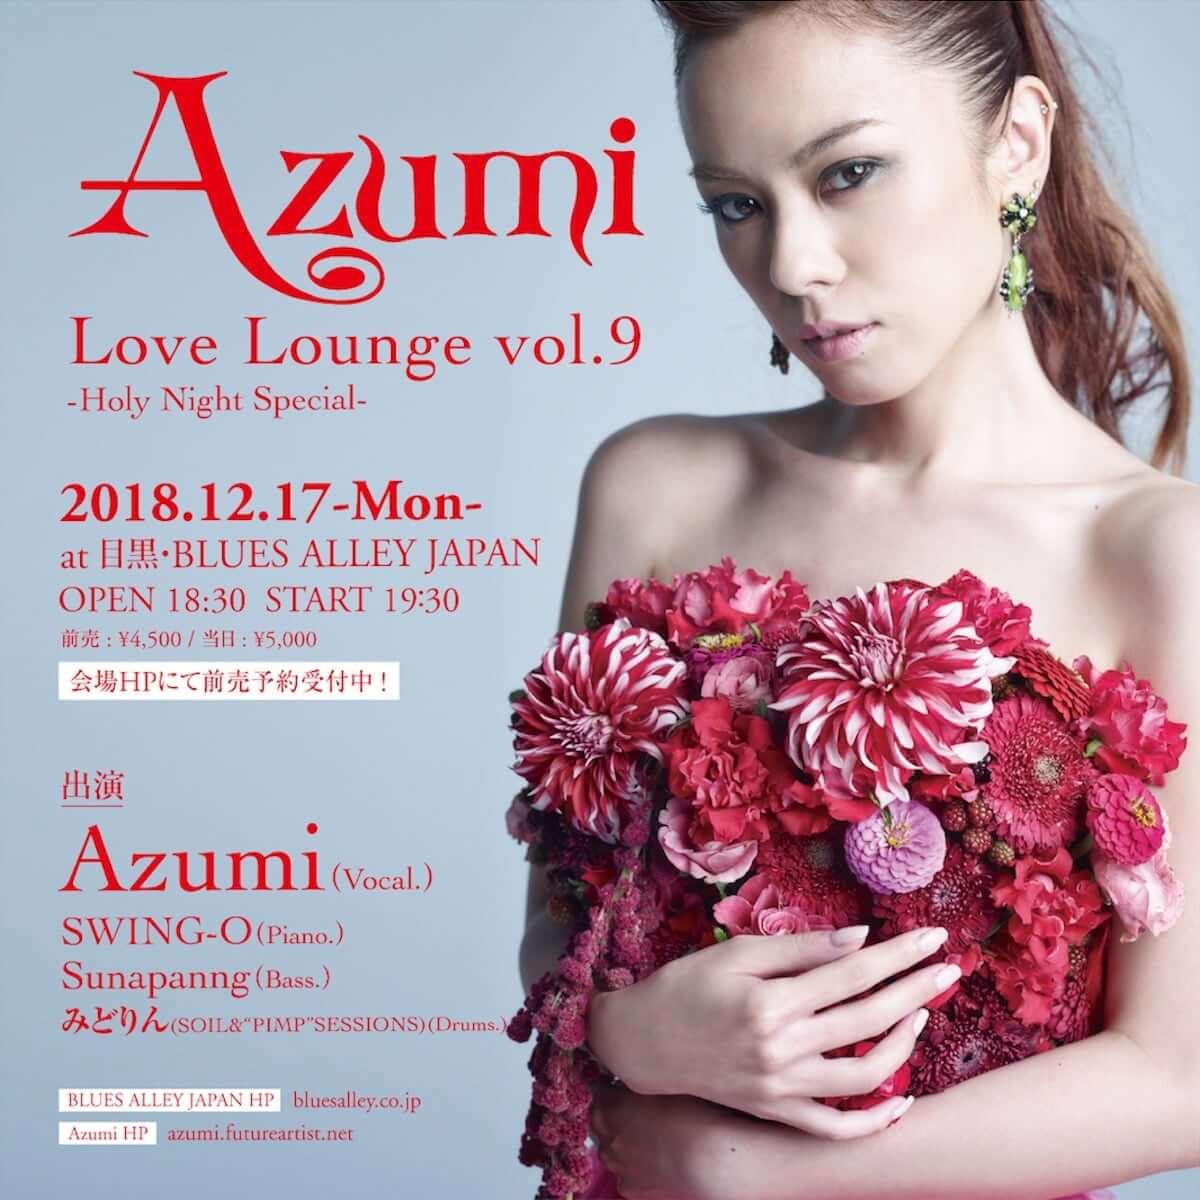 Azumi(ex.Wyolica)が1stソロアルバムから最新作までの集大成となるワンマンライブを開催! music181204_azumi_1-1200x1200